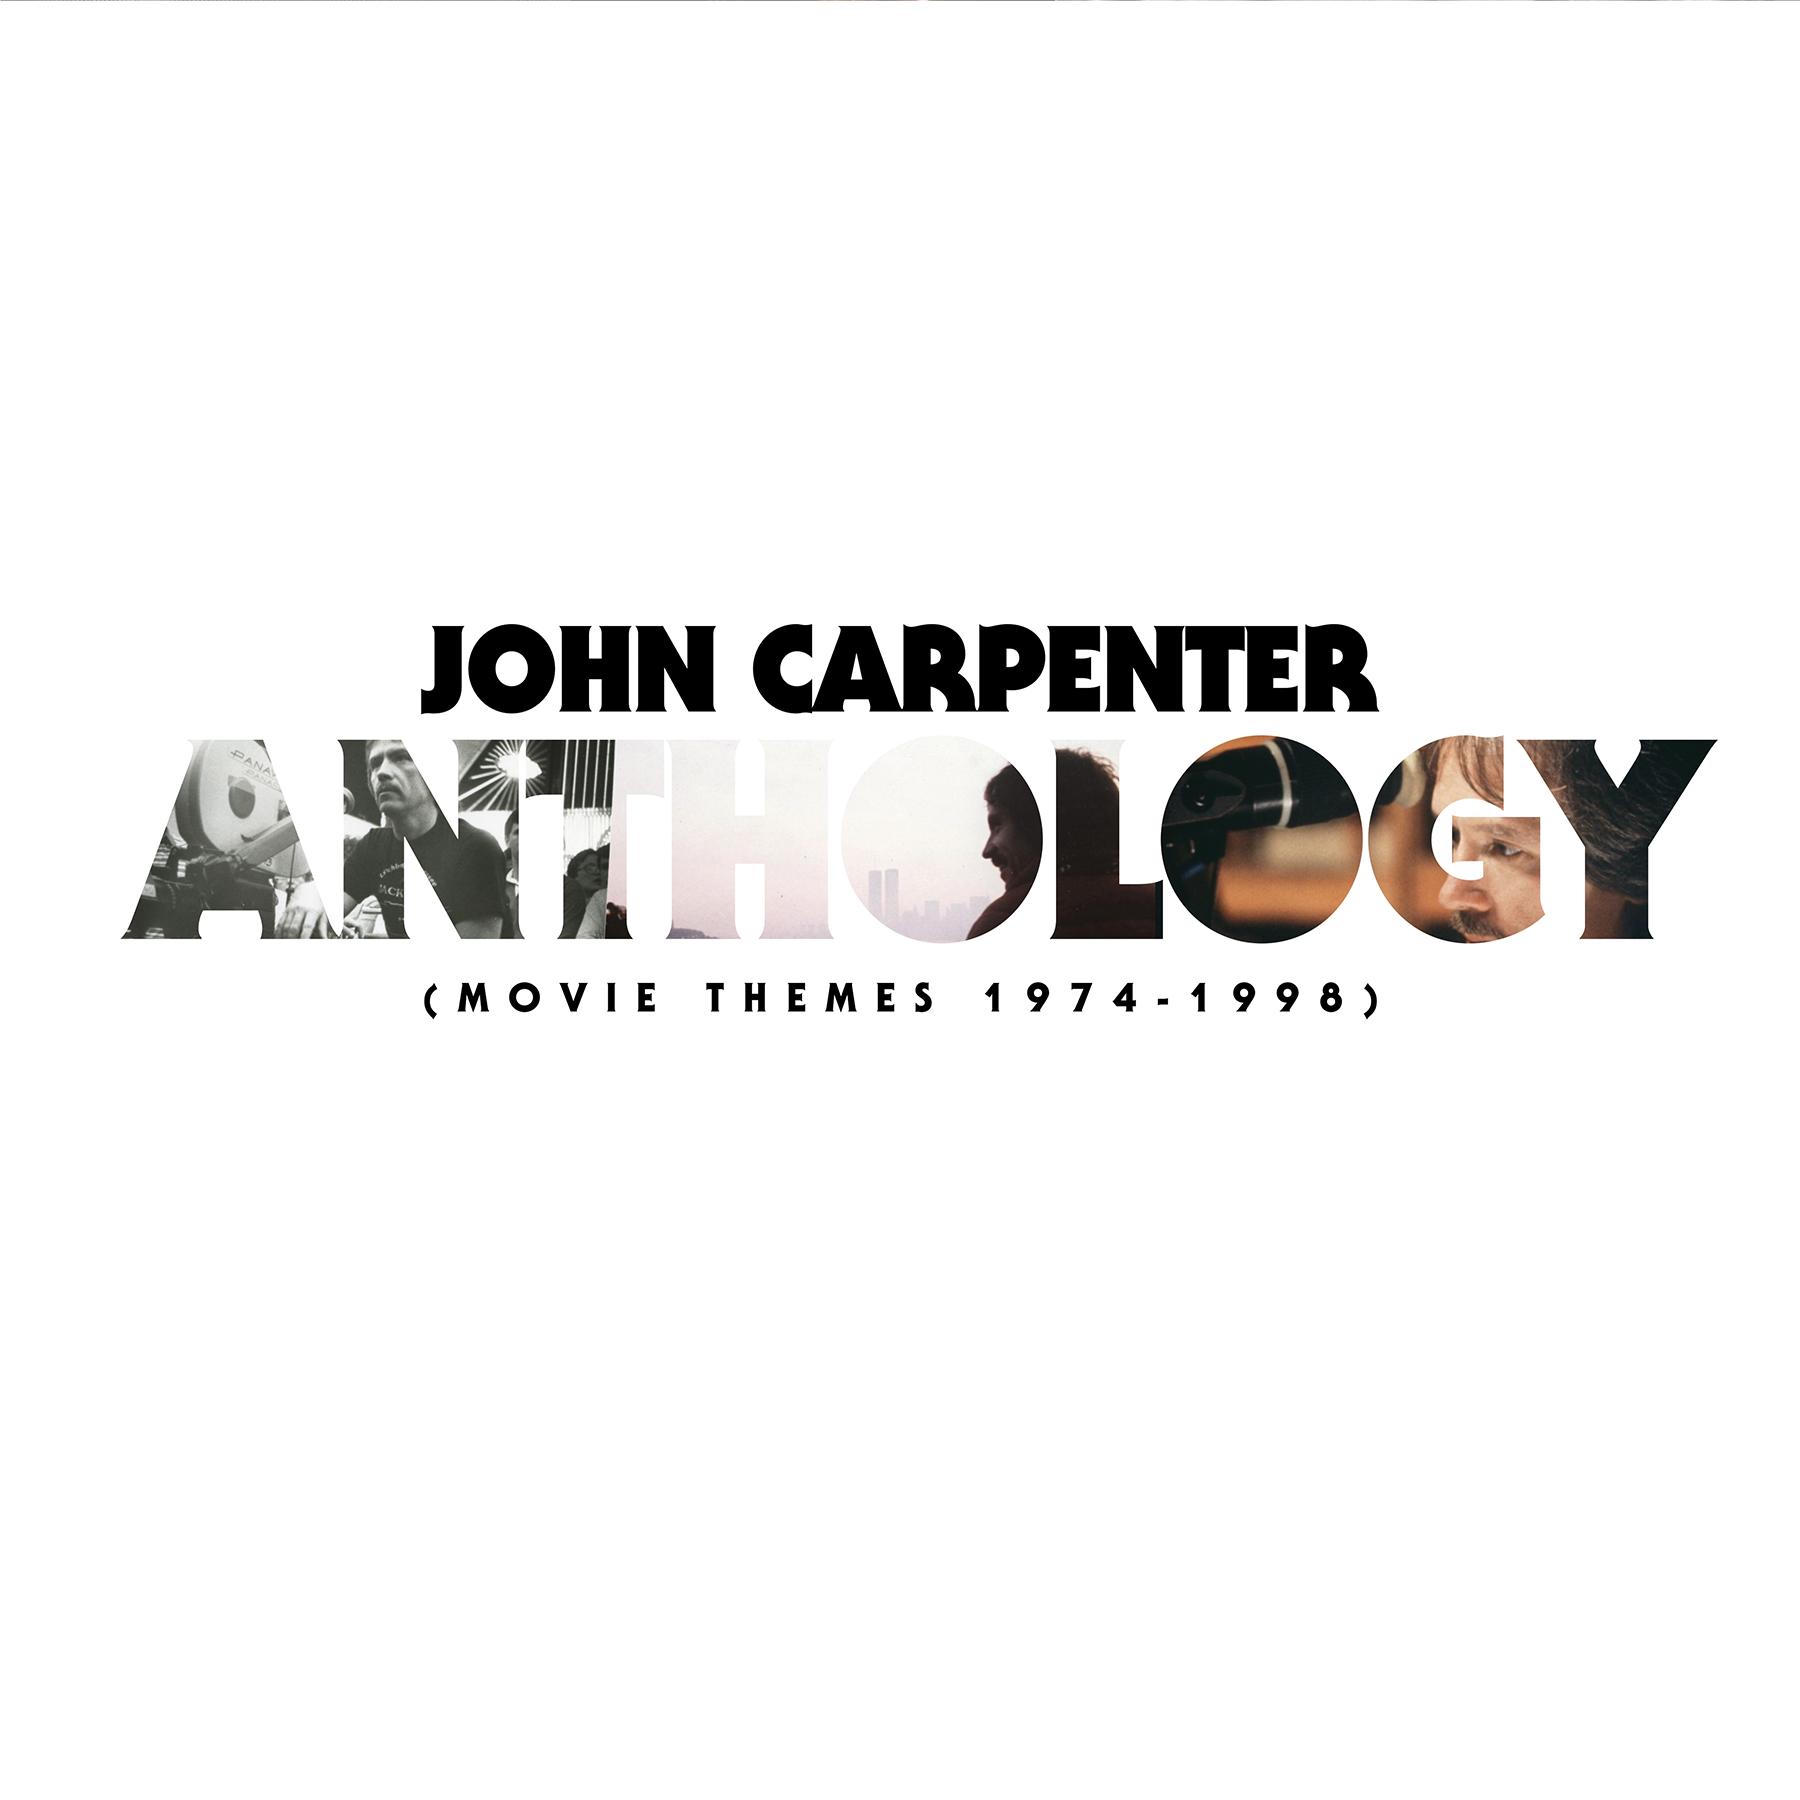 John Carpenter - Anthology: Movie Themes 1974-1998 - Album ...